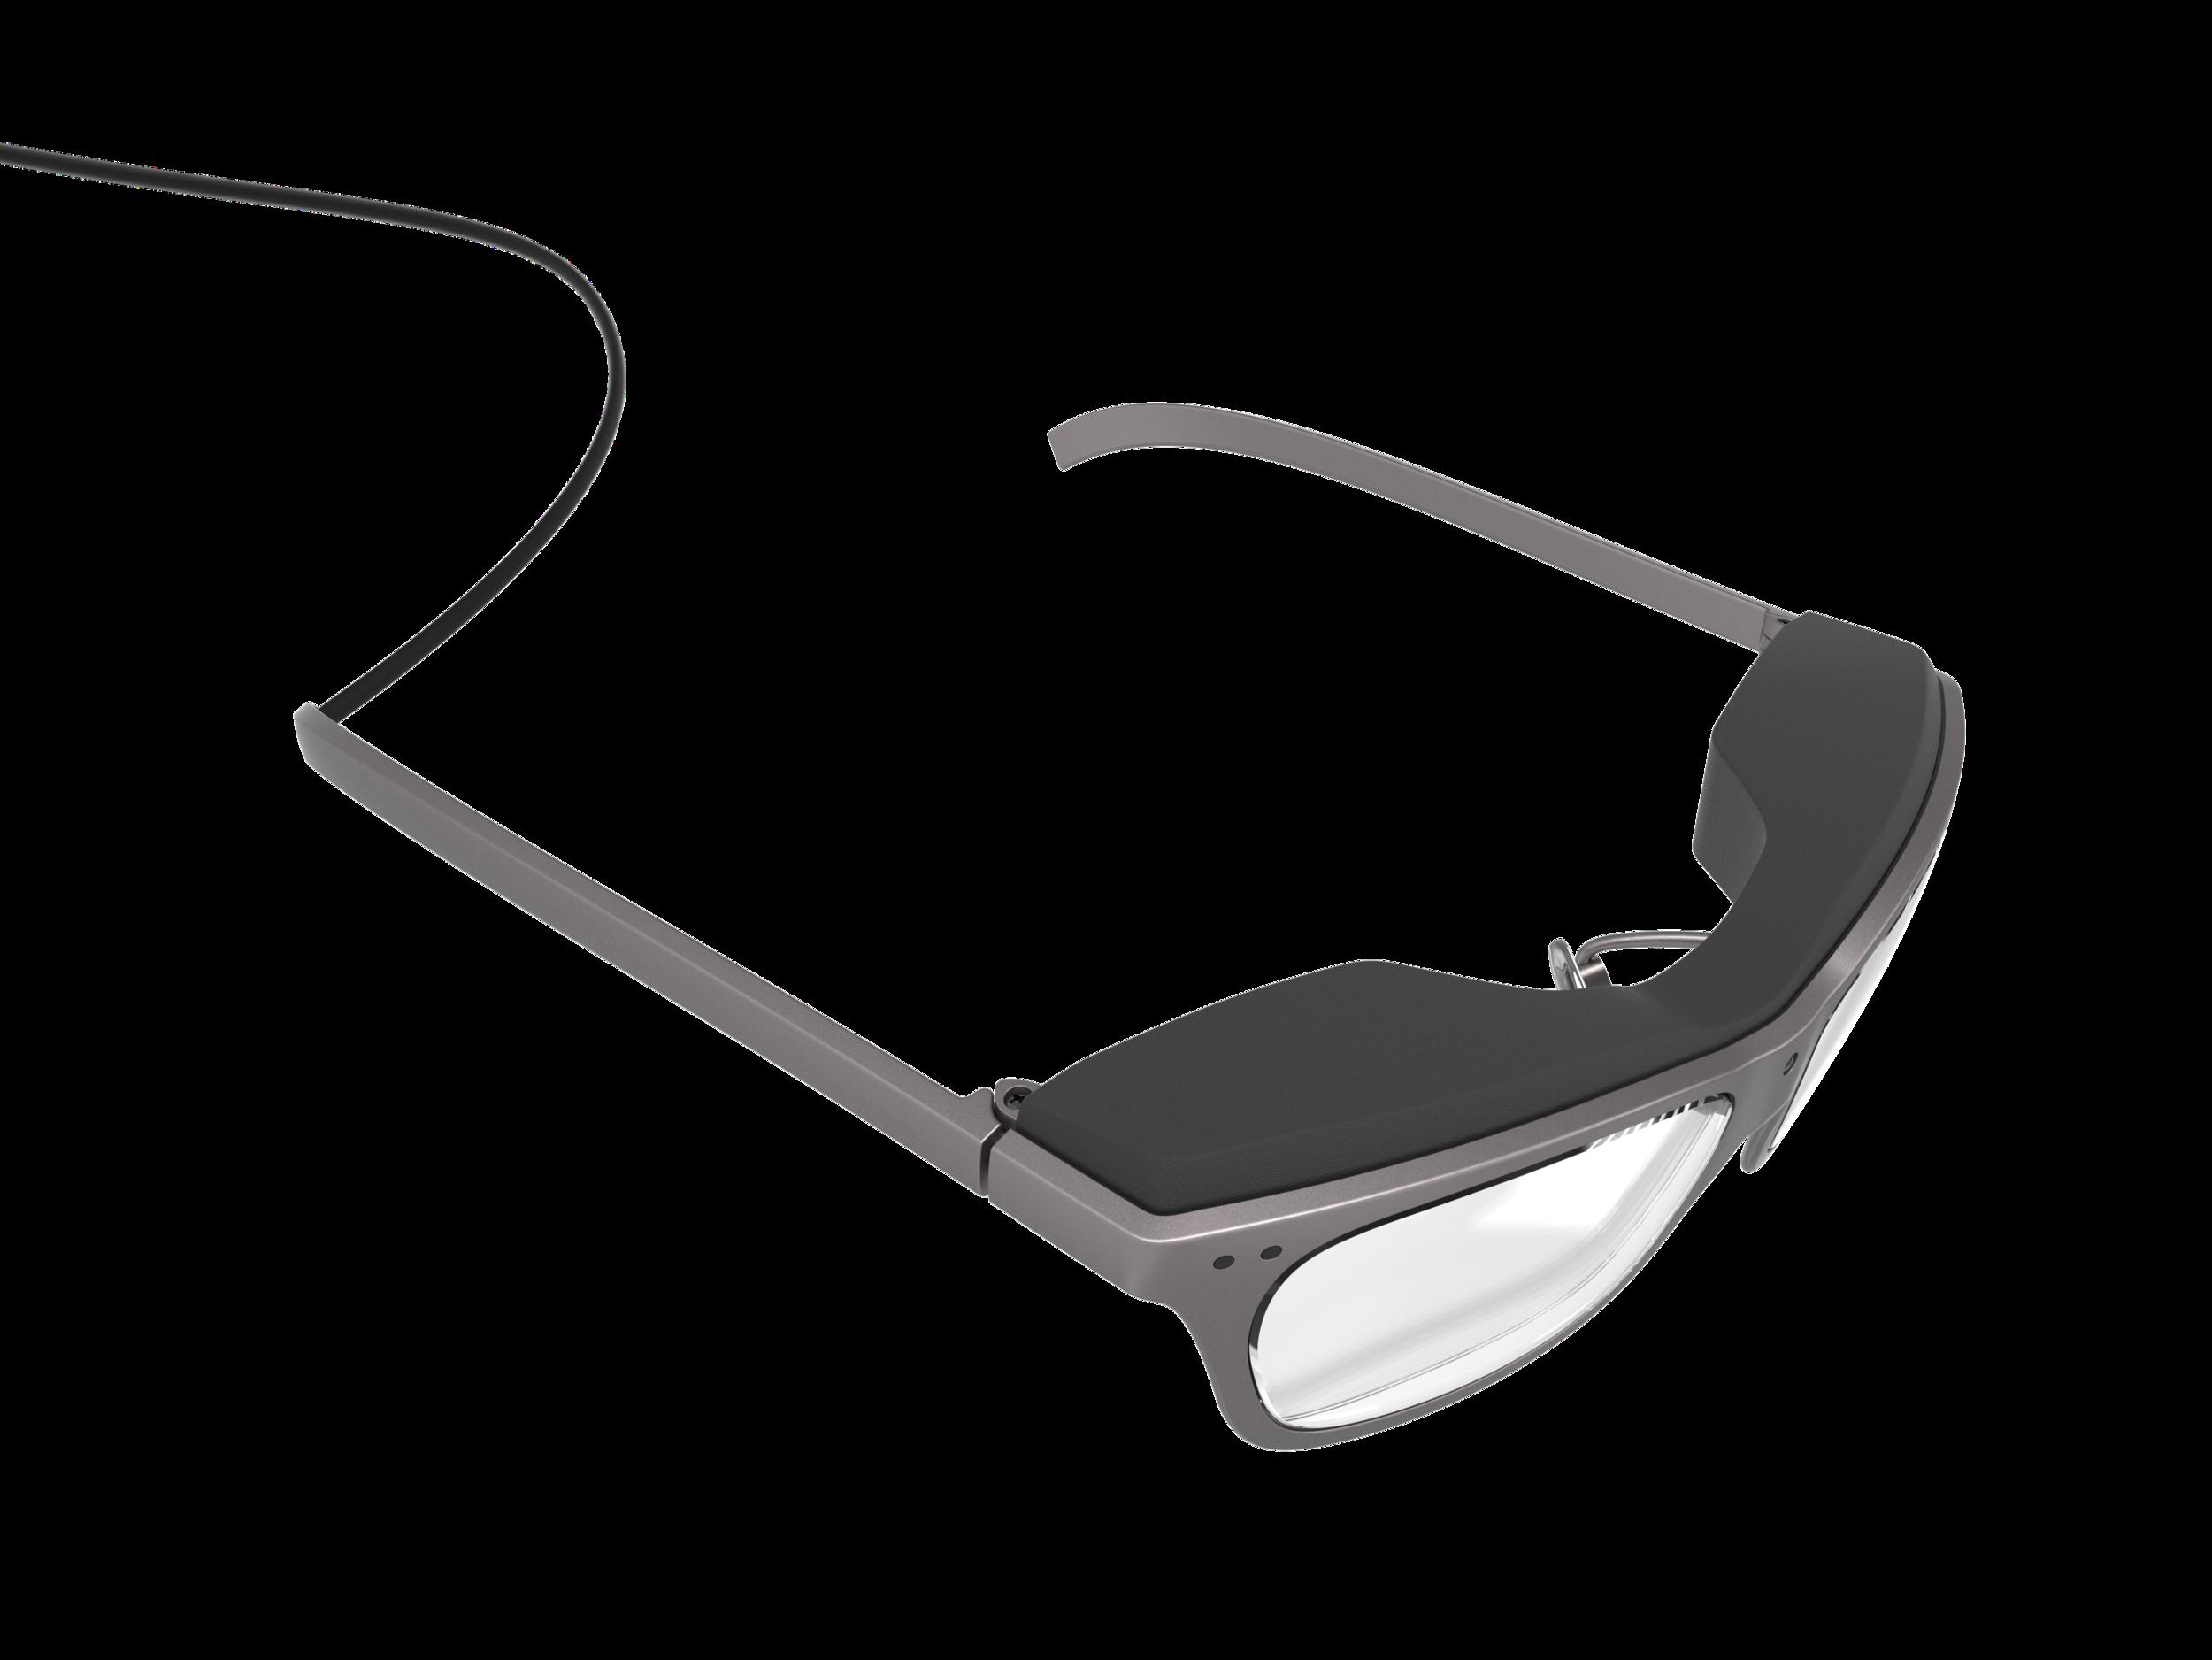 Top perspective of the man's concept design WaveOptics glasses